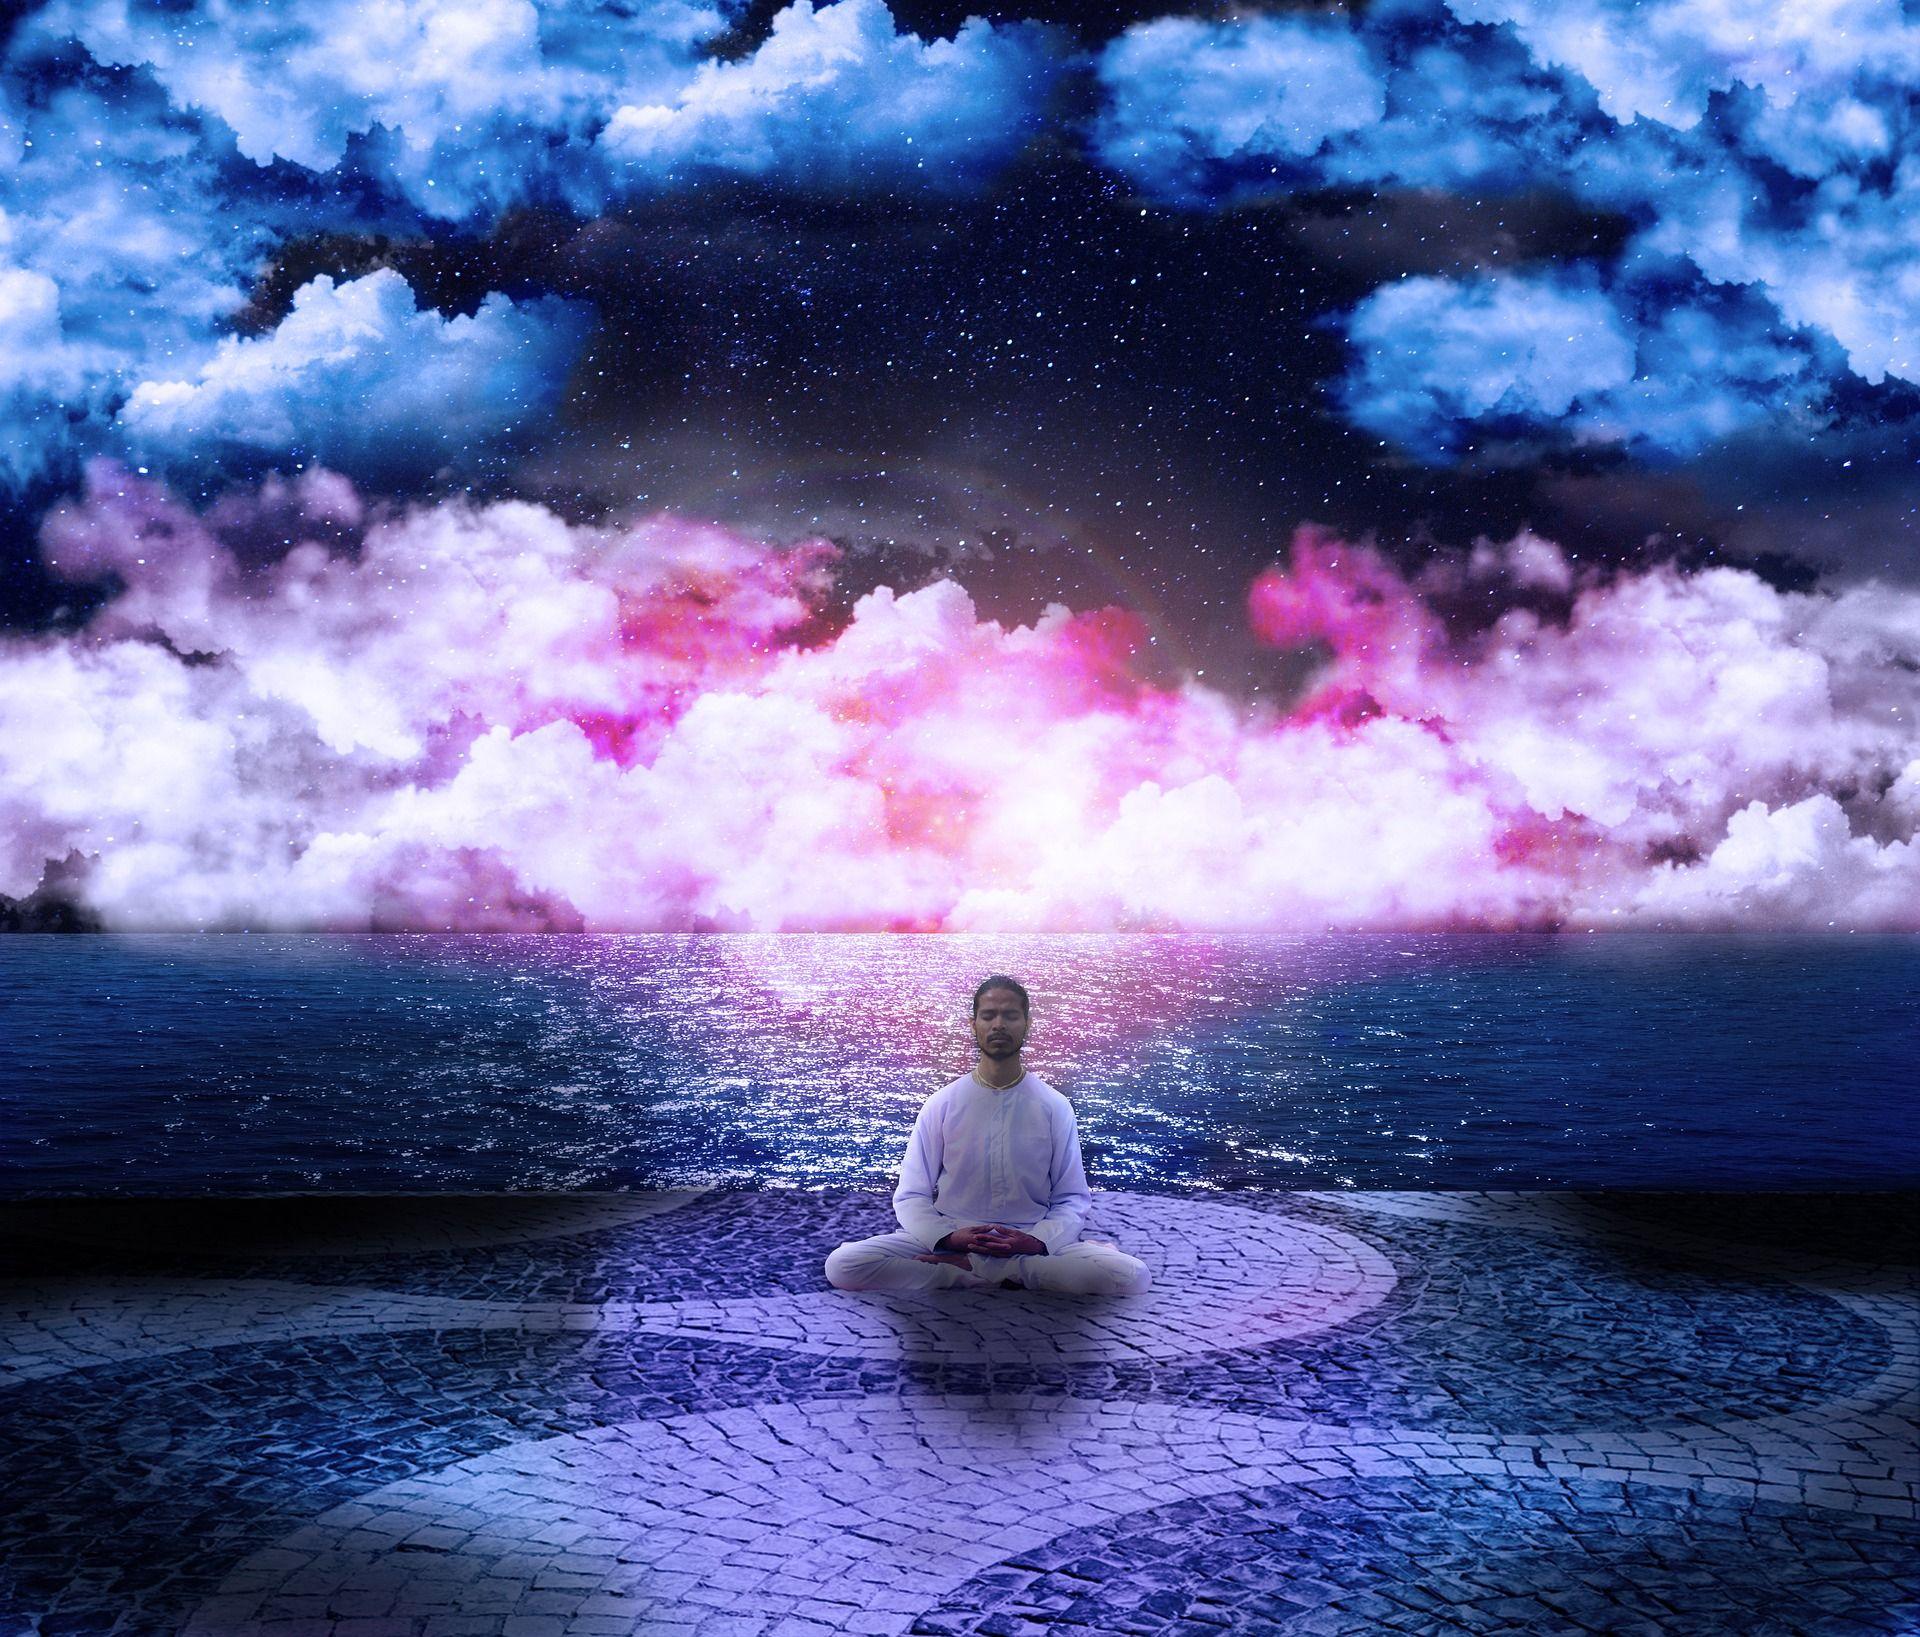 Recuperar la calma retiros espirituales de fin de semana en madrid sanando al ser